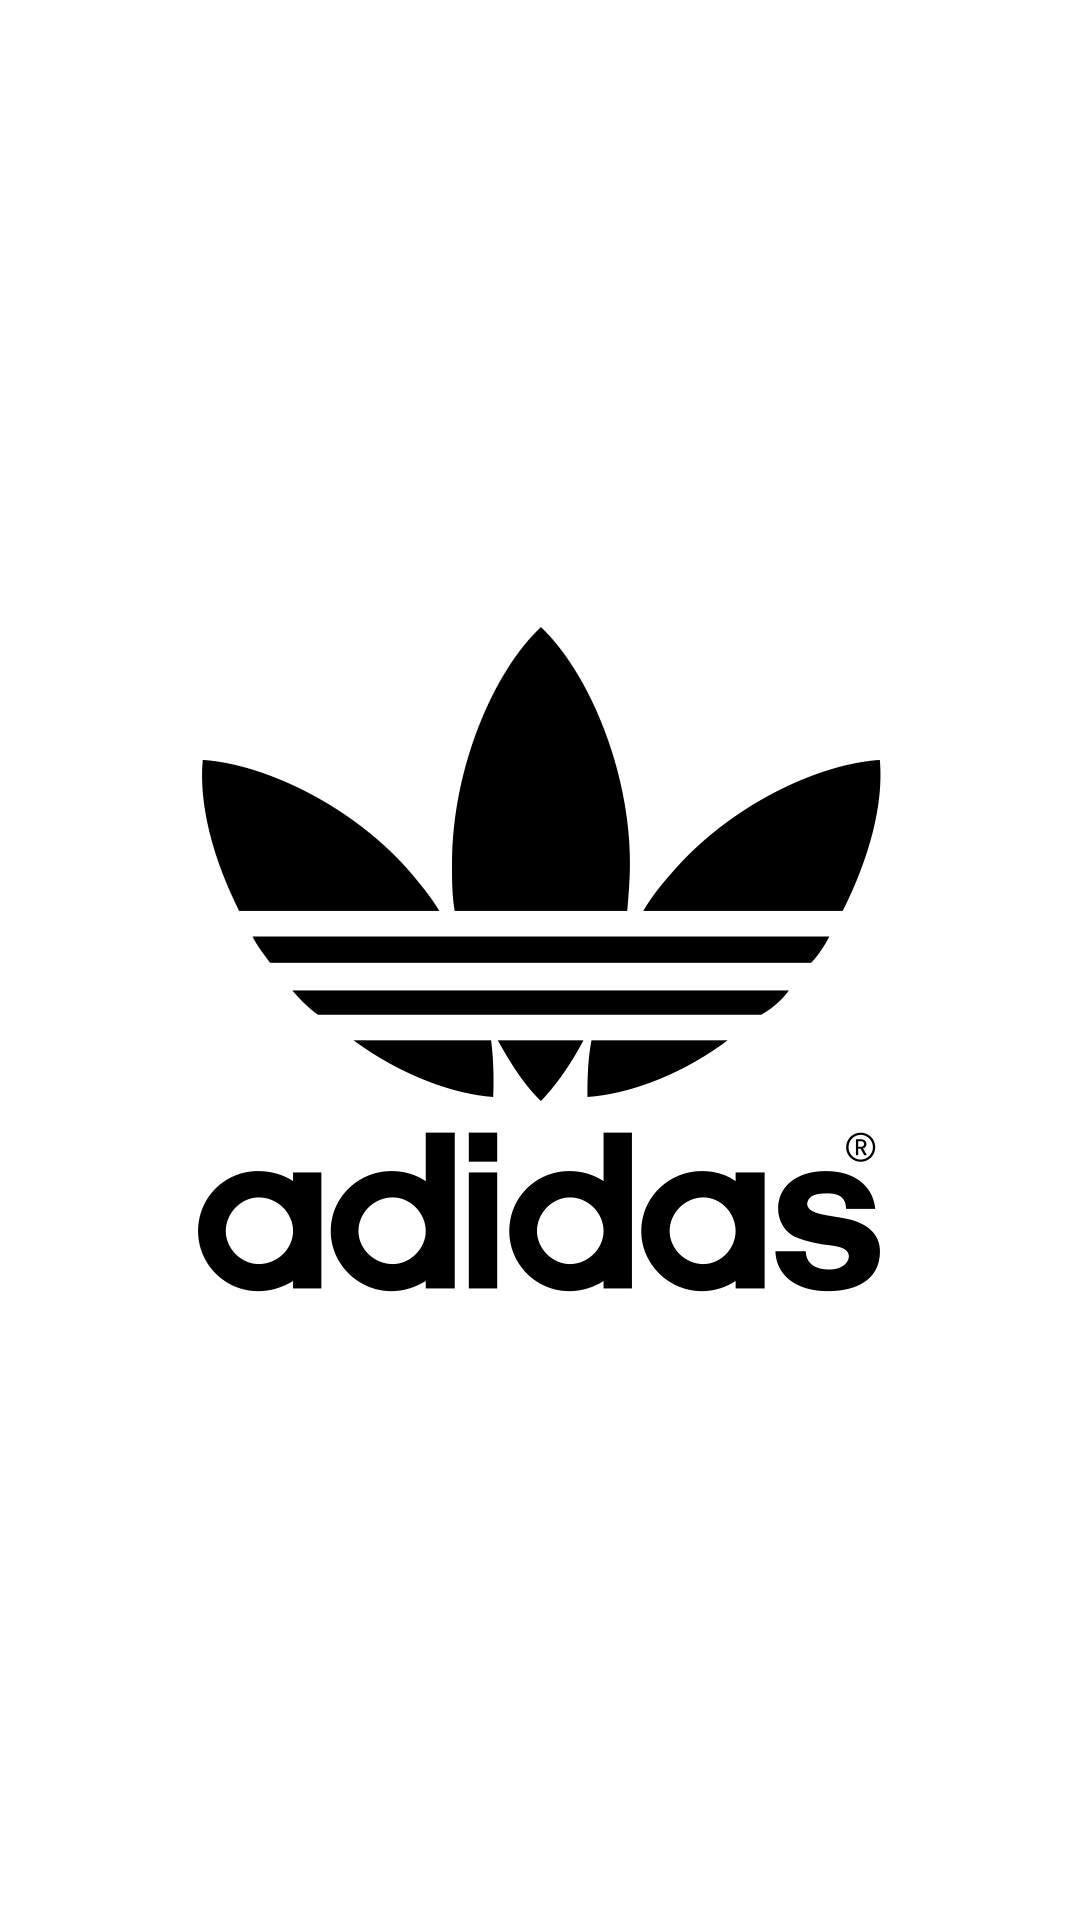 adidas Logo iPhone Wallpaper   Adidas   Pinterest   Adidas